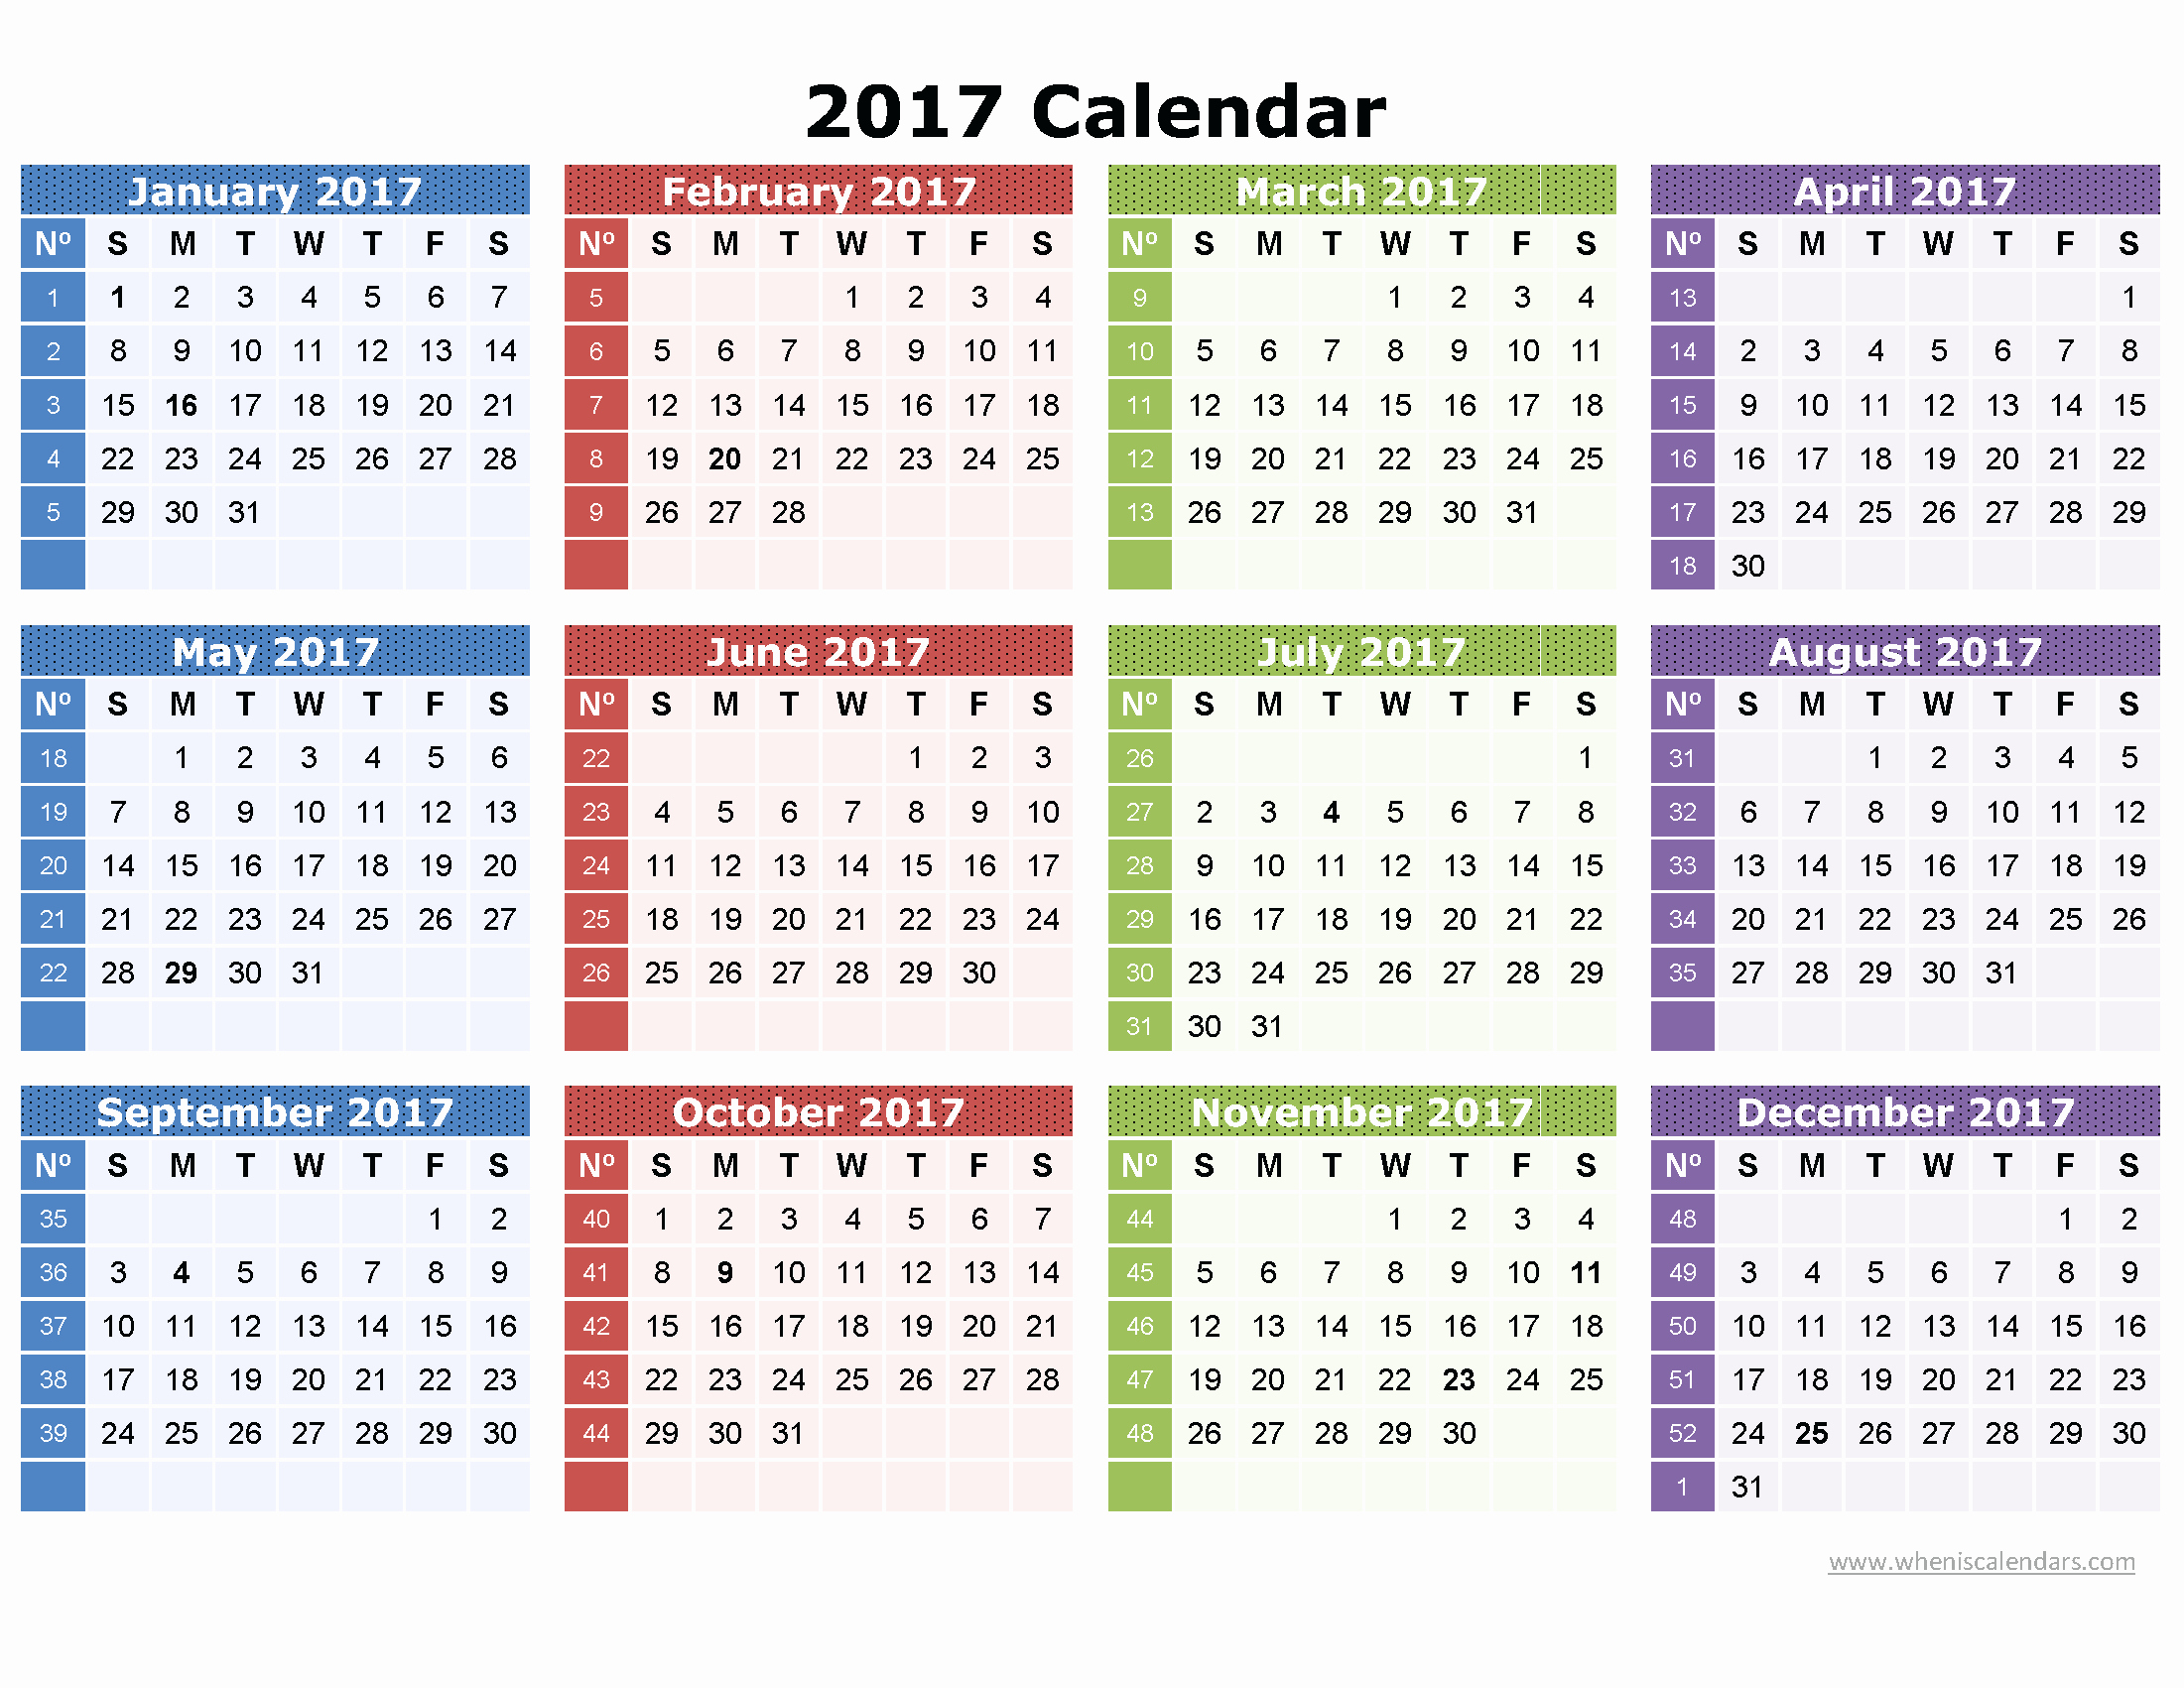 2017 Full Year Calendar Template Unique 2017 Year Calendar Wallpaper Download Free 2017 Calendar